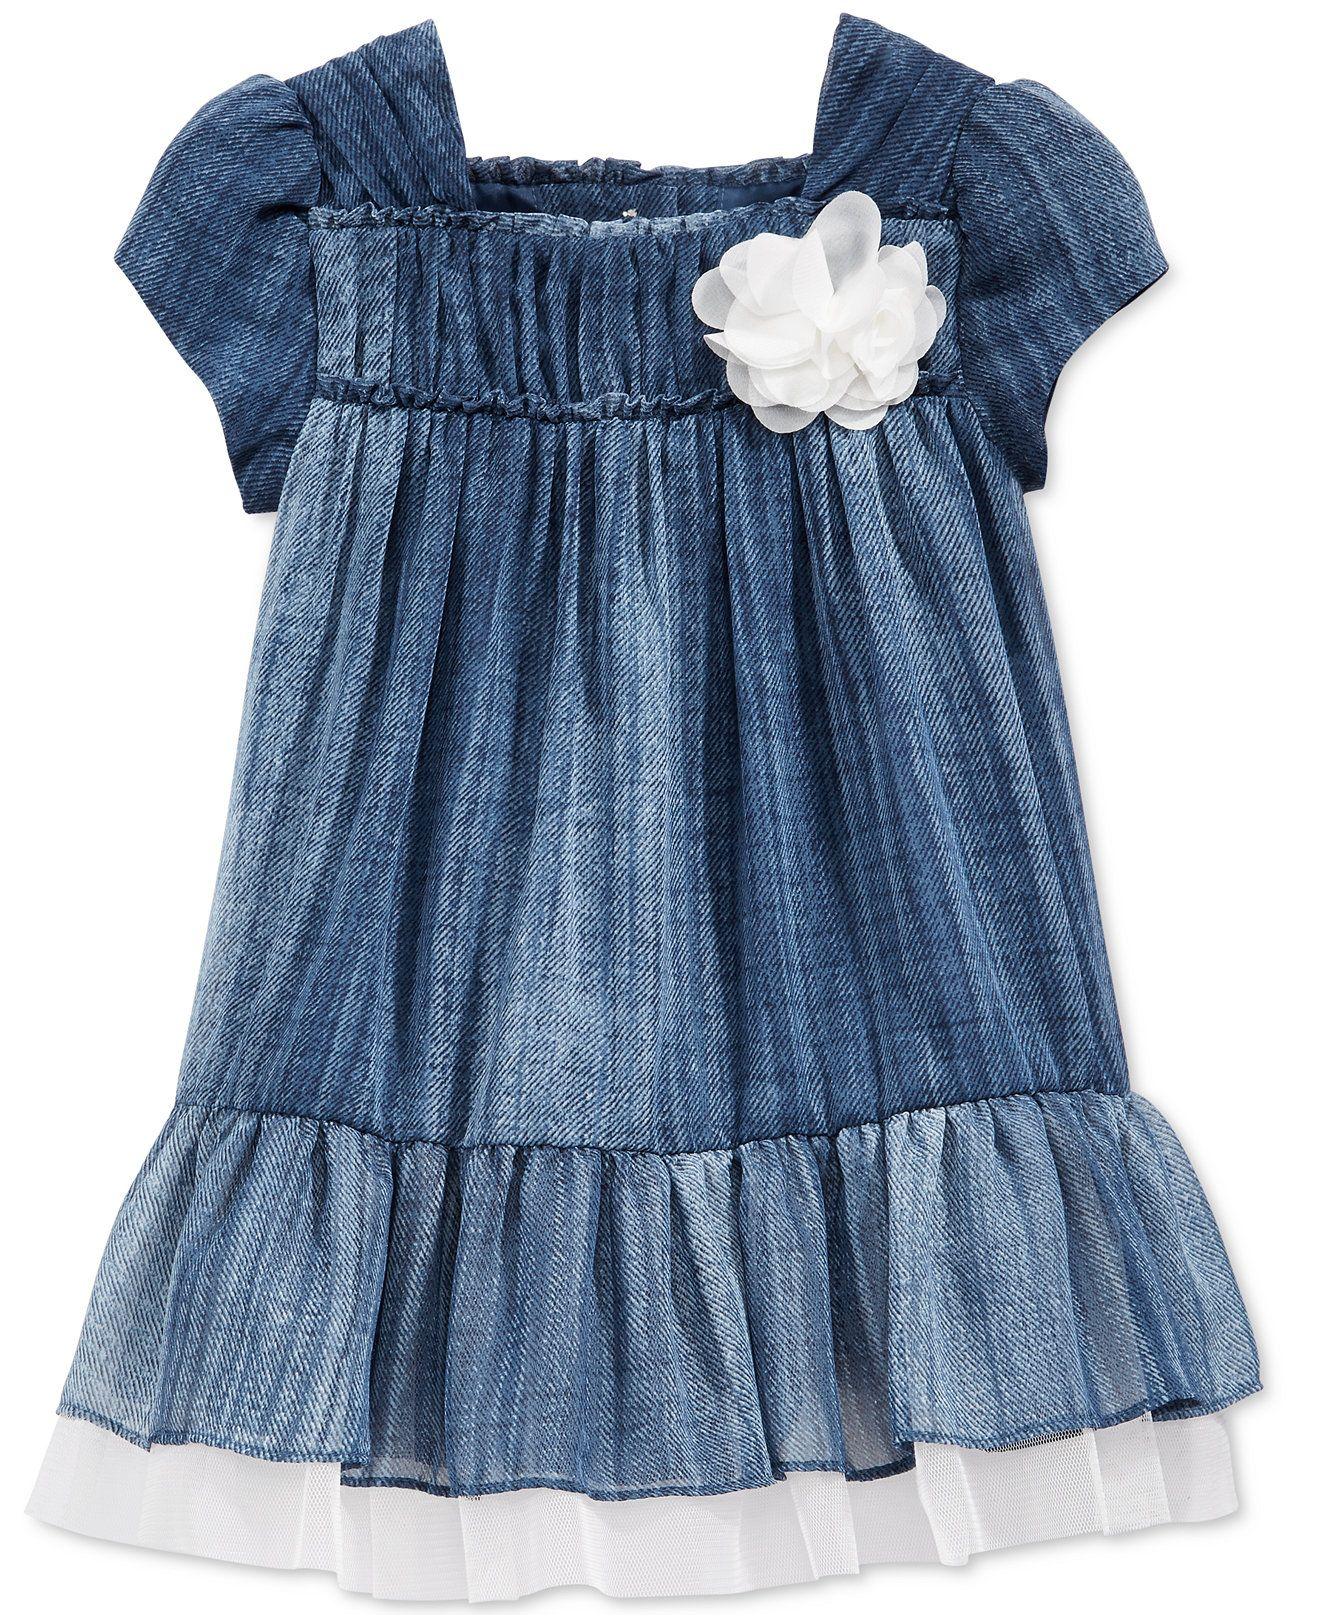 Bonnie baby baby girls denim chiffon dress dresses